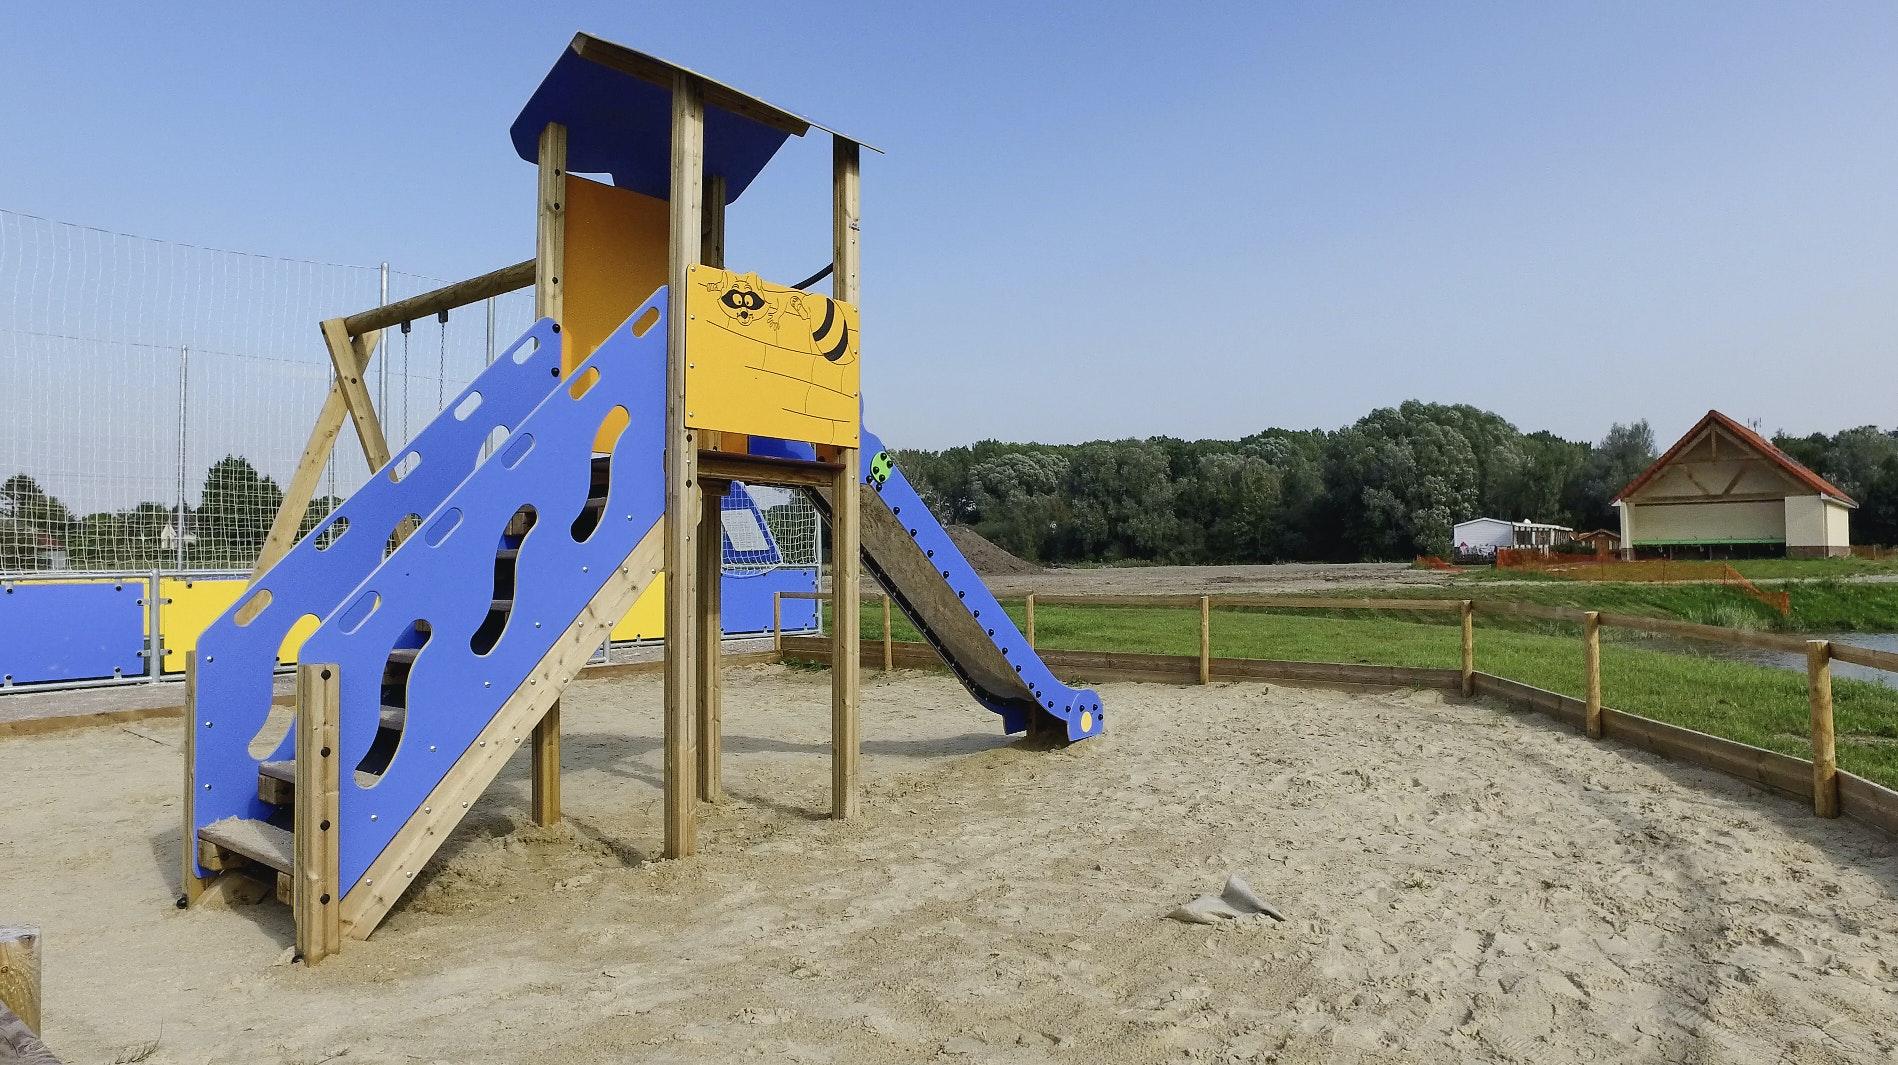 Domaine de la Roseliere speeltuin